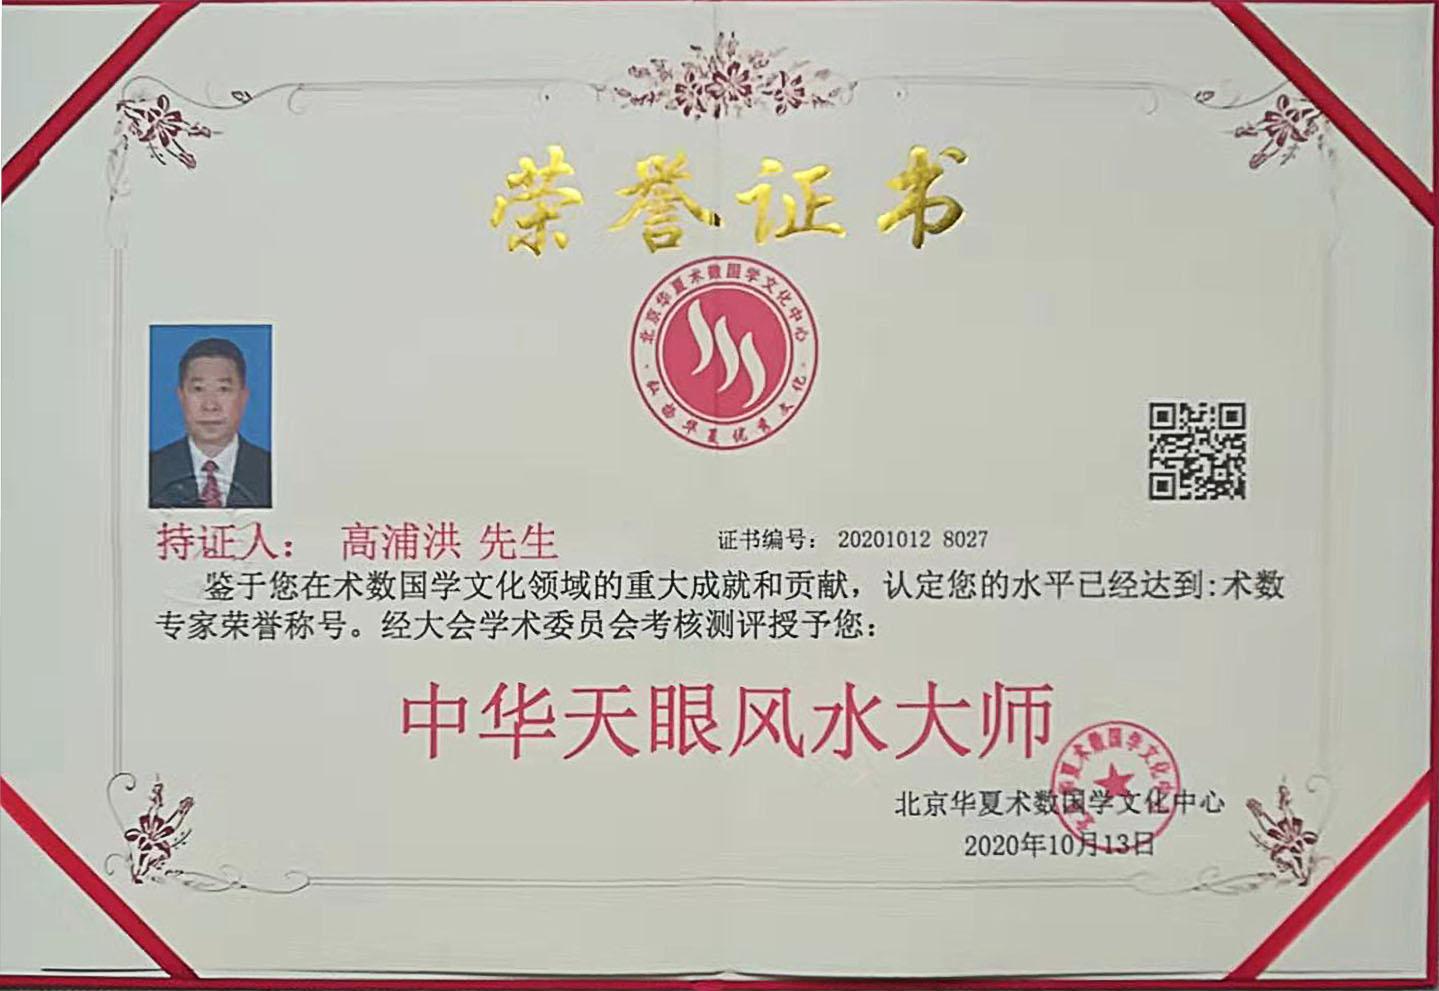 title='天眼风水大师高浦洪'